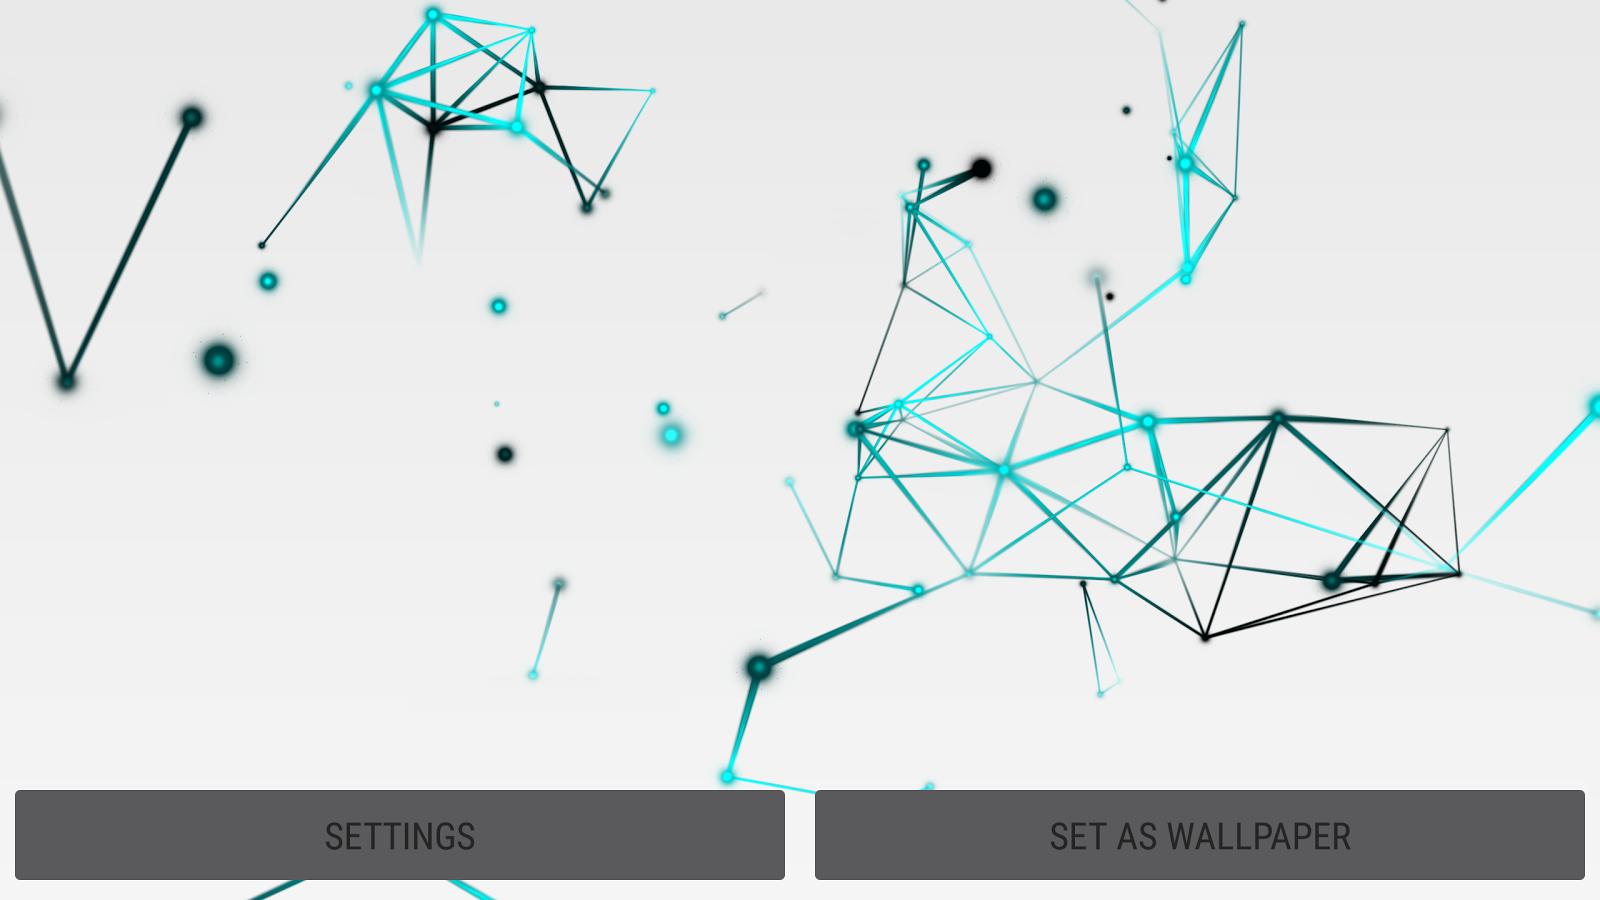 3d Abstract Particle Plexus Live Wallpaper Apk 3d Abstract Particle Plexus Live Wallpaper Apk Cracked